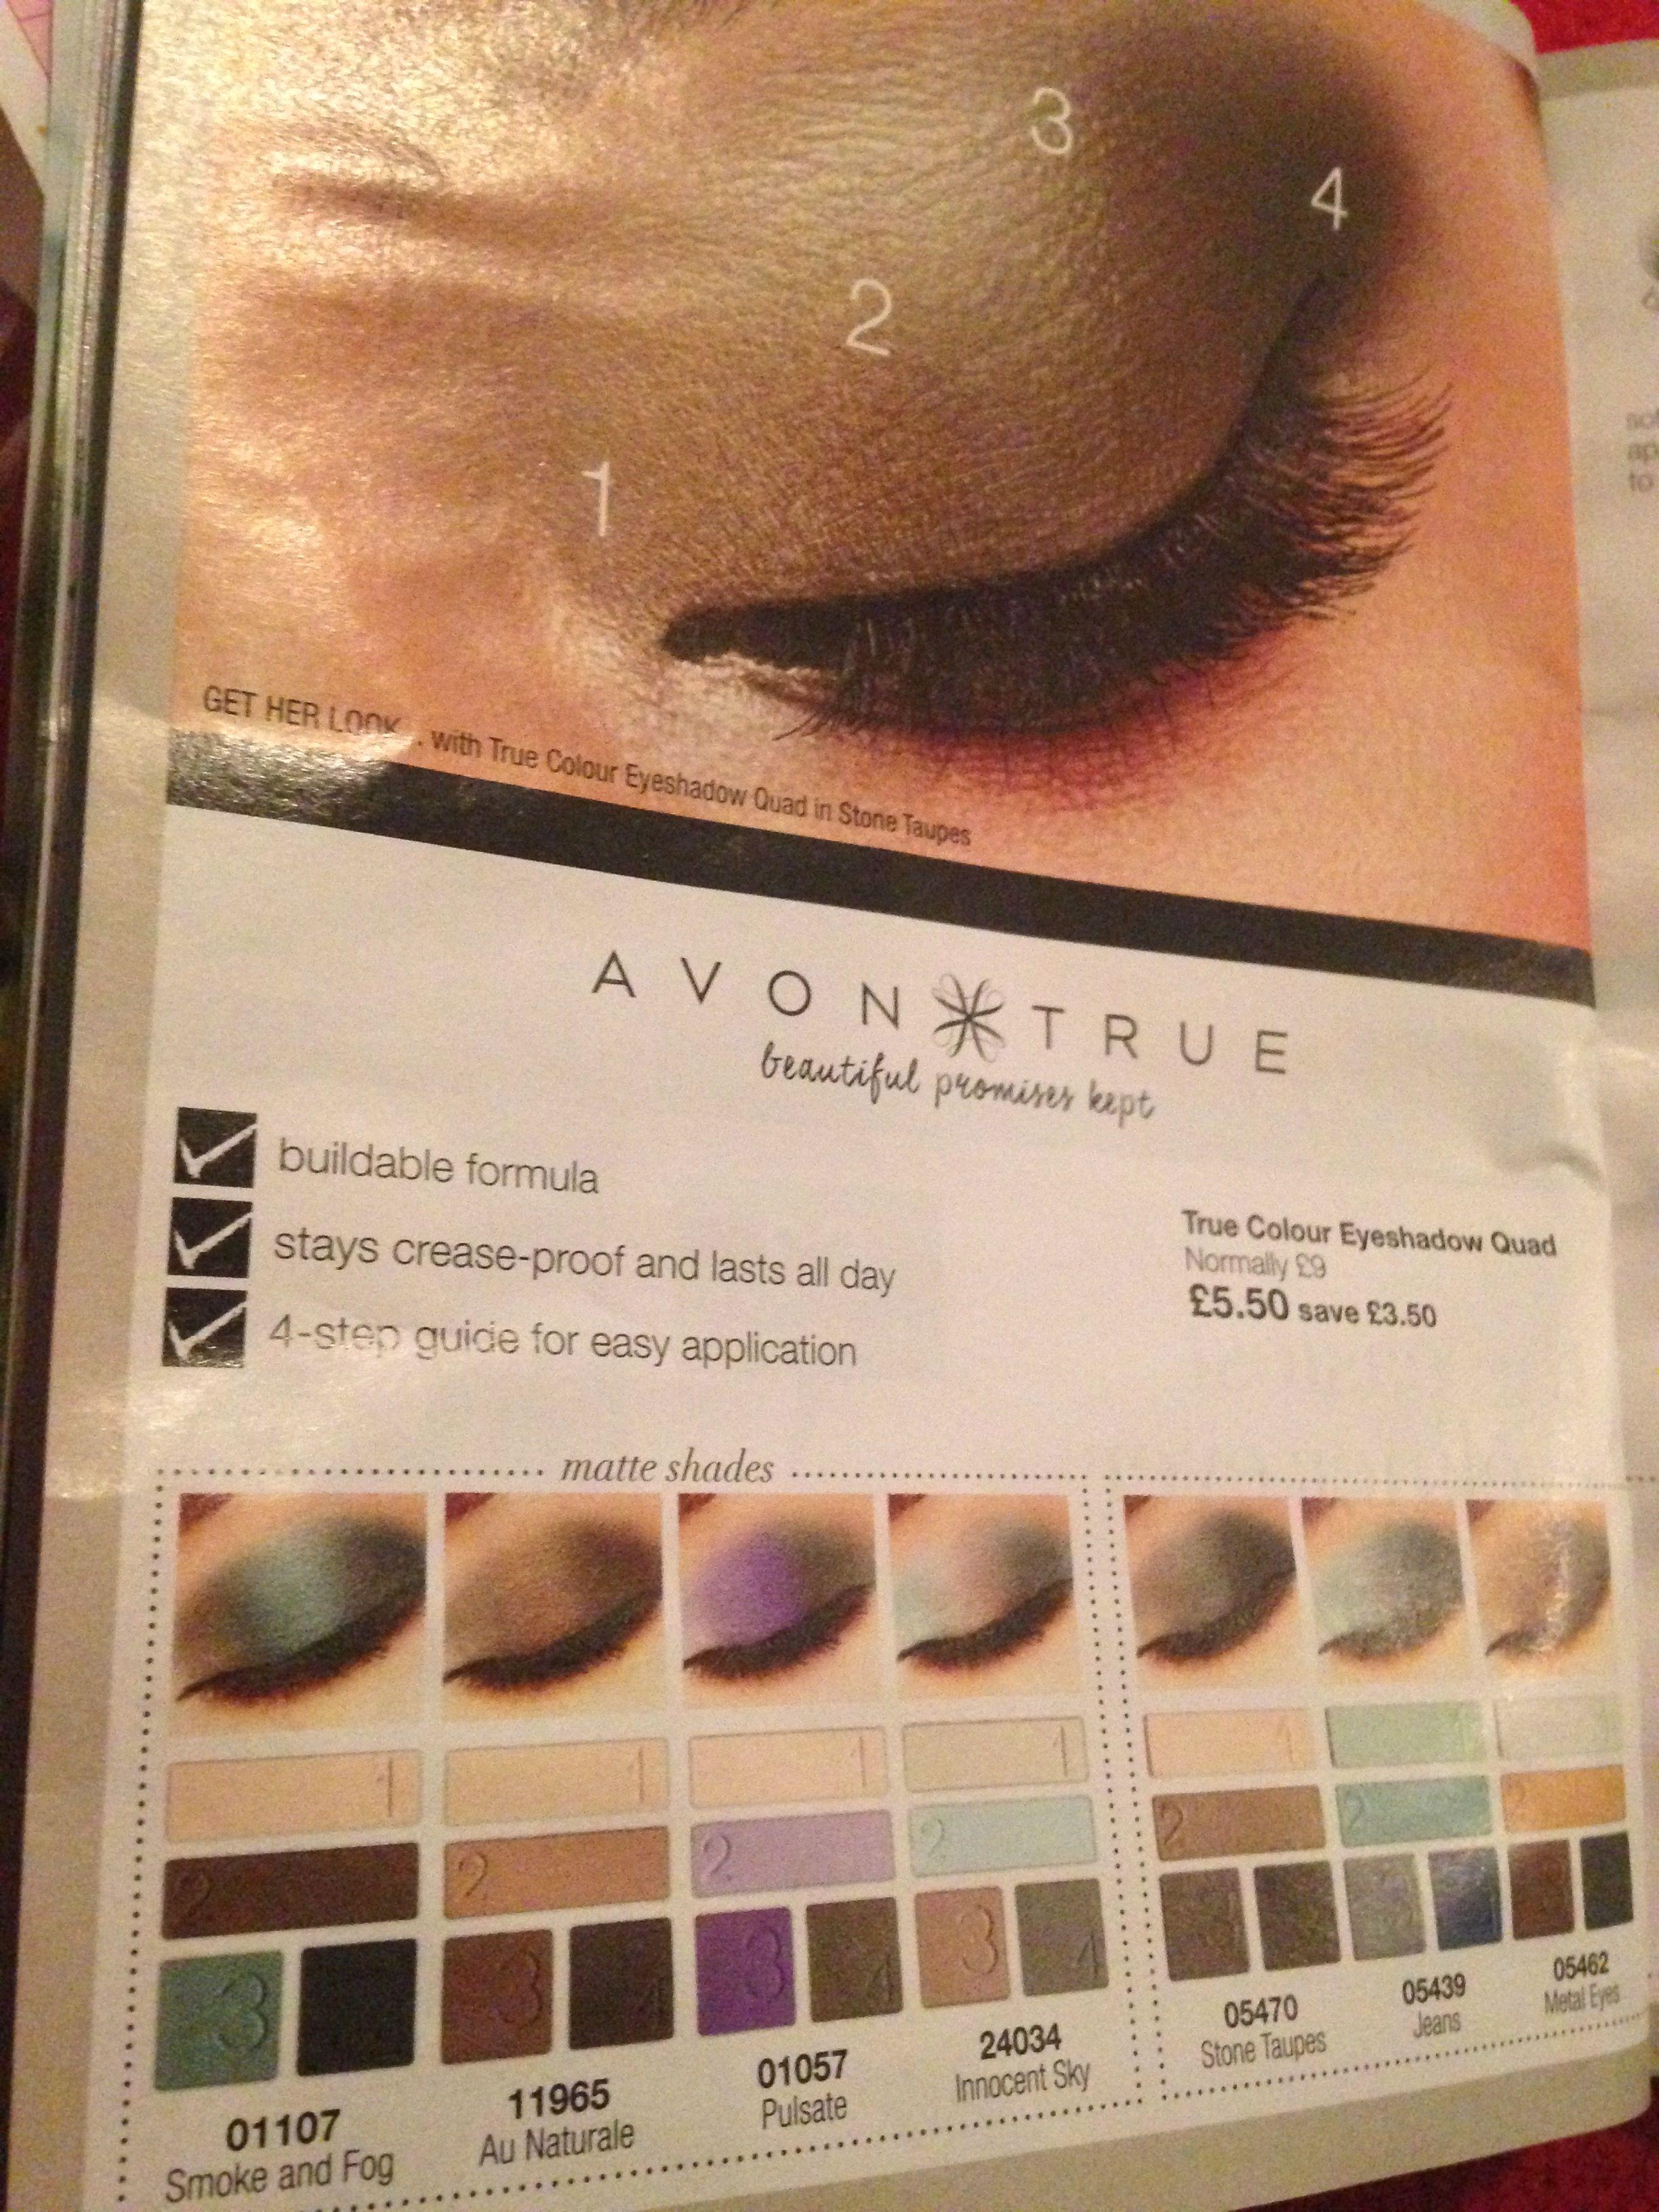 Avon Wish List Perfect Eye Makeup To Compliment Avon Mascara